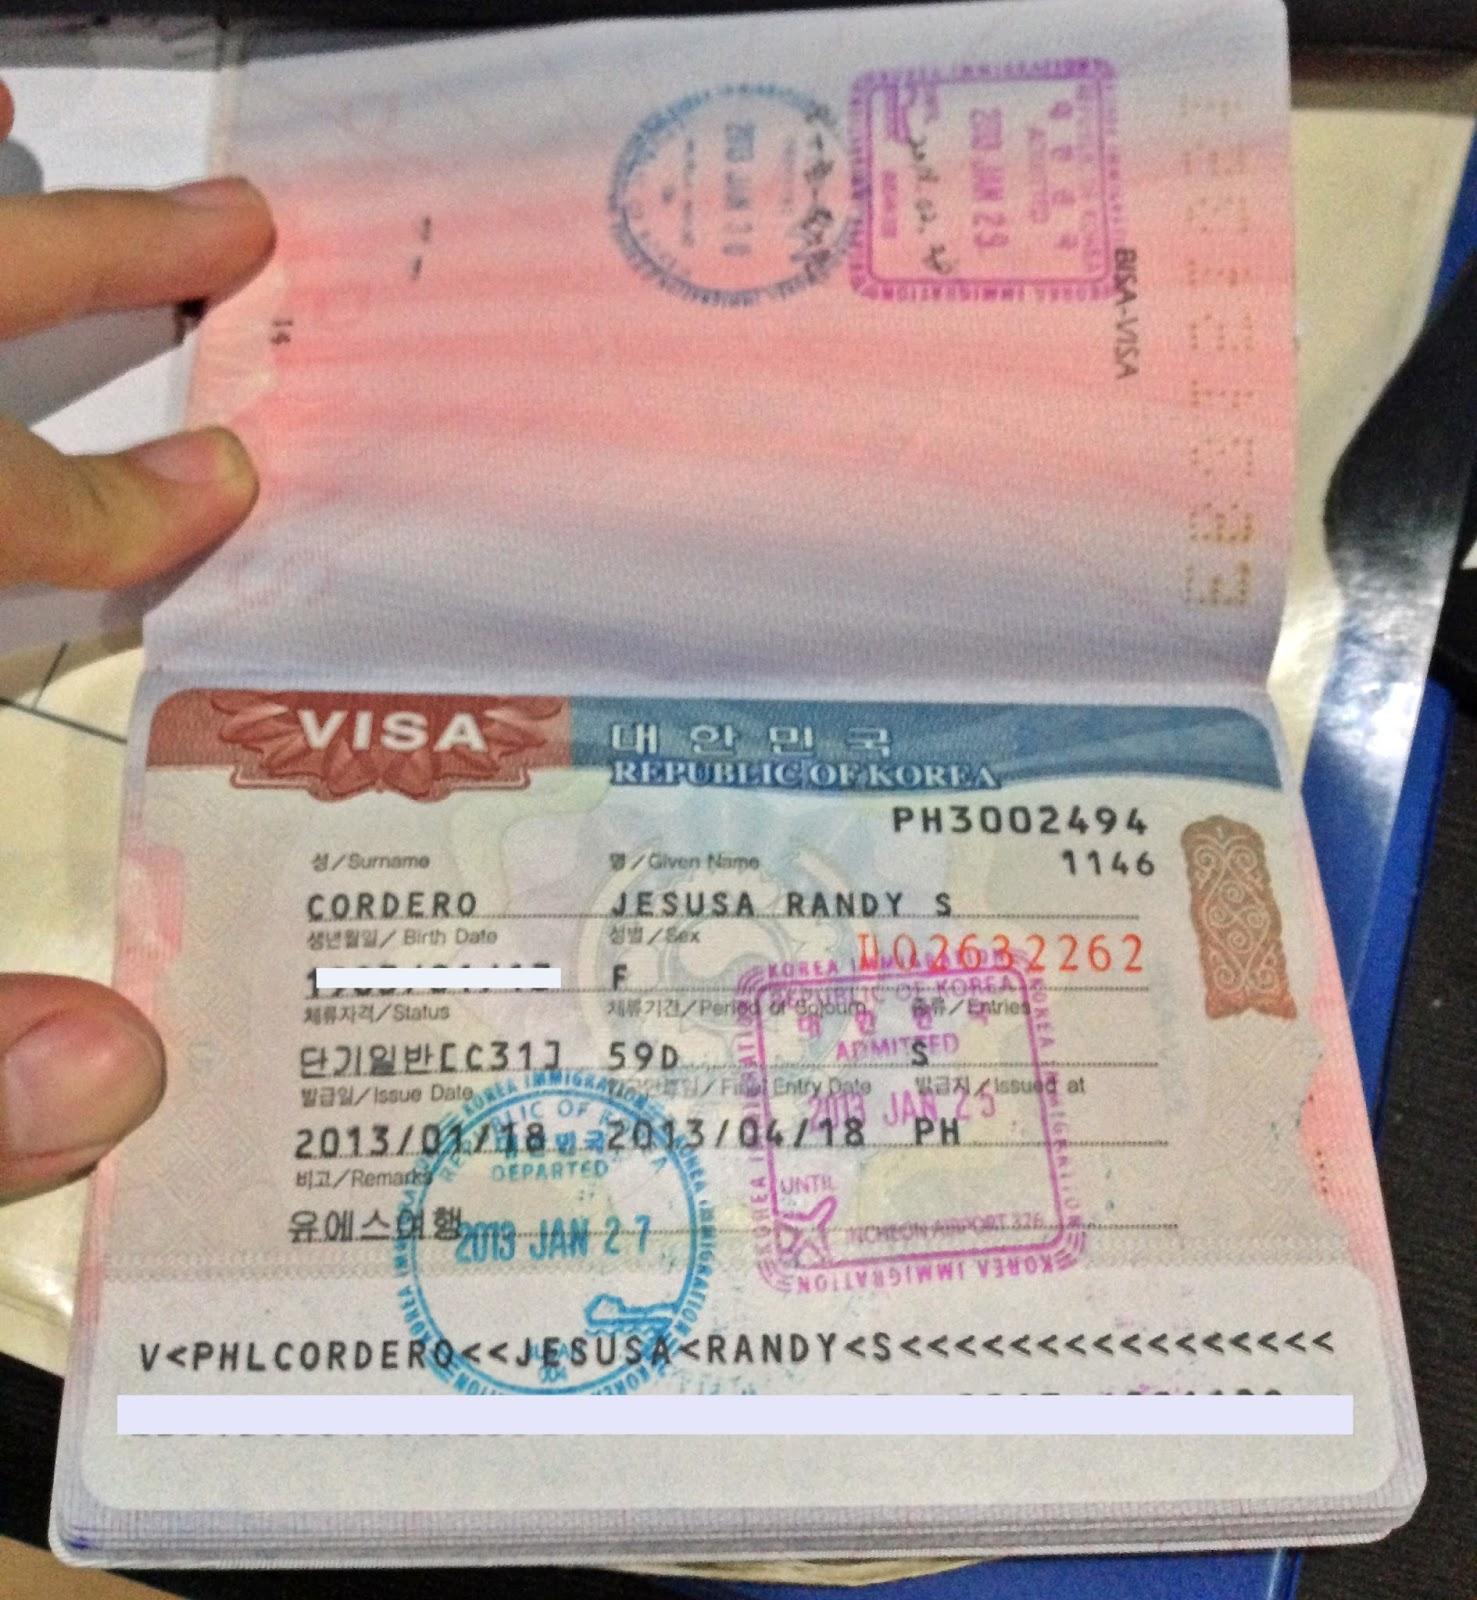 photo+2+%25282%2529 Vietnam Visa On Arrival Application Form on uk visa application form, united states visa application form, vietnam visa application form, contact us form,